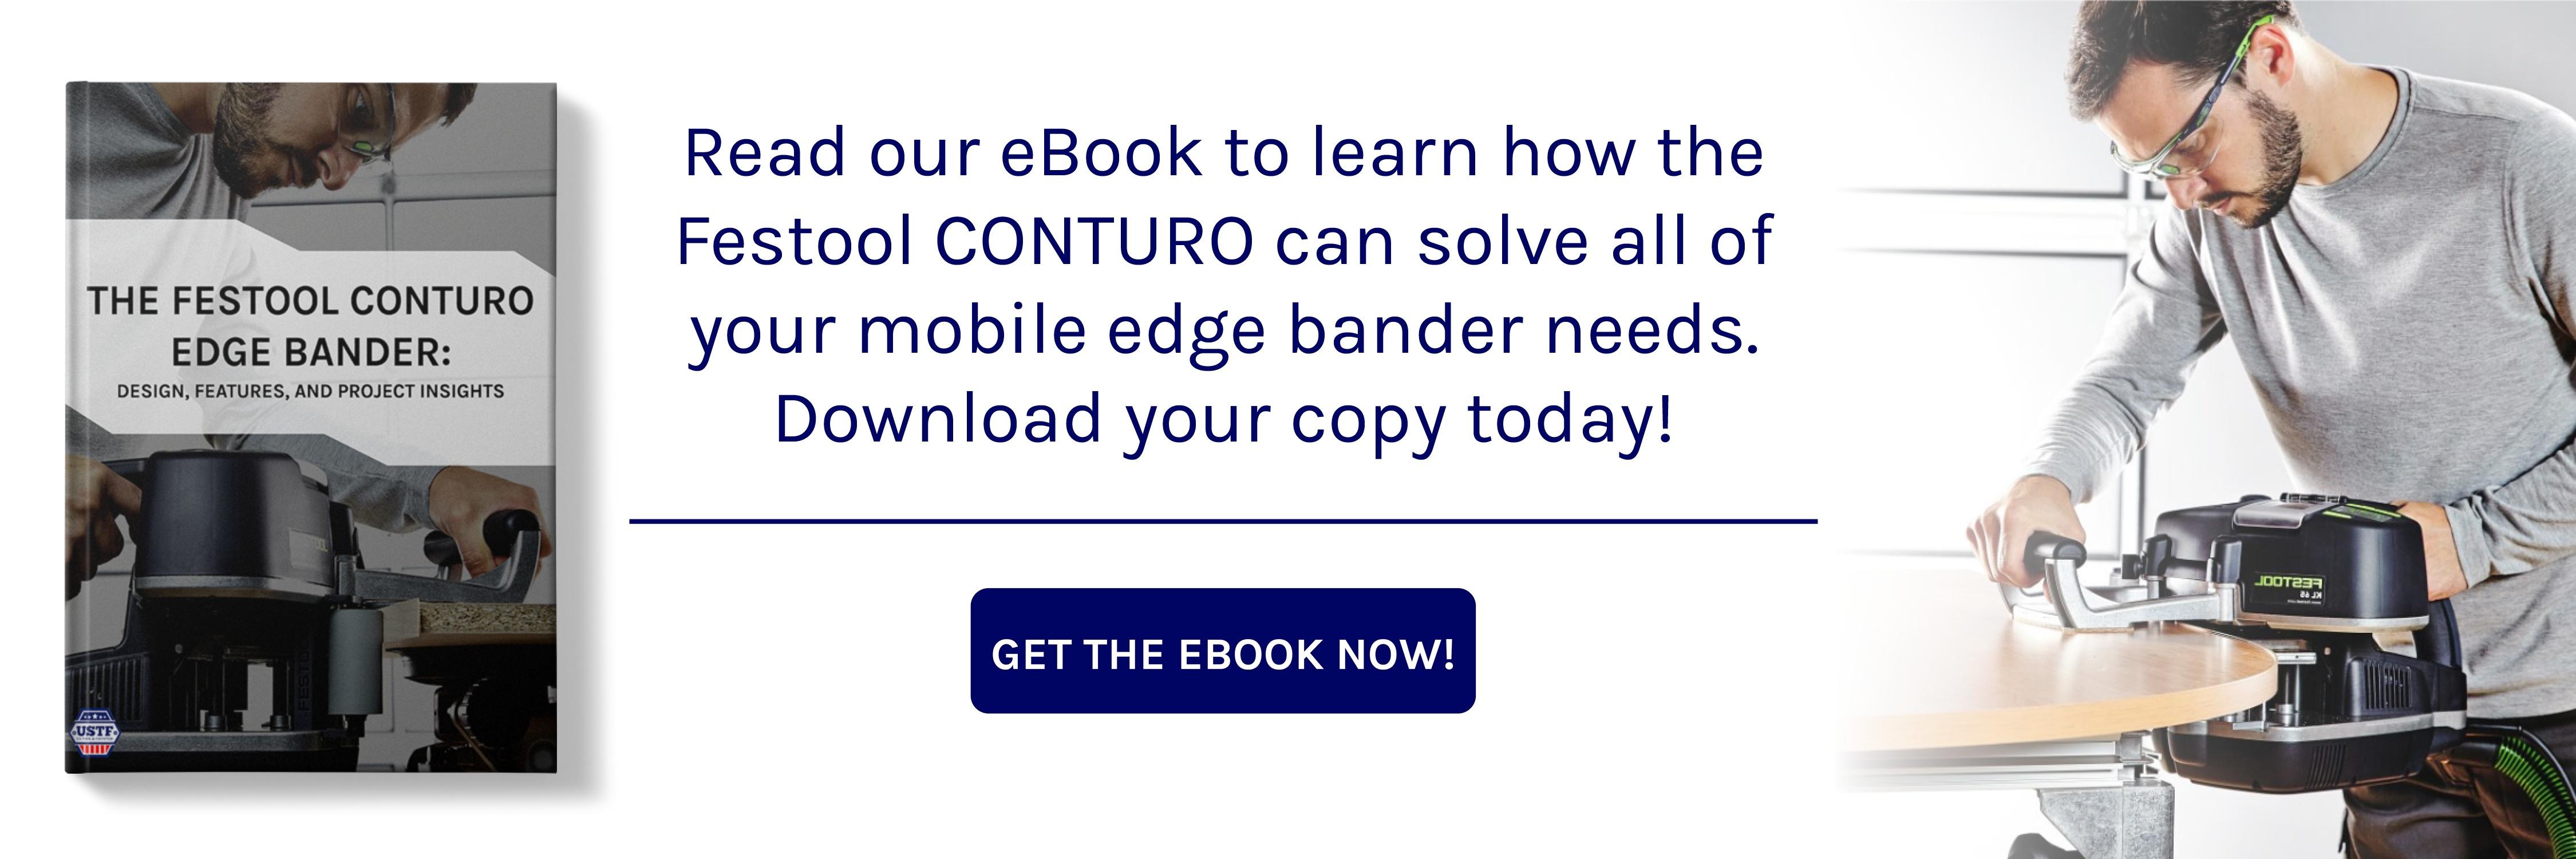 The Festool CONTURO Edge Bander ebook